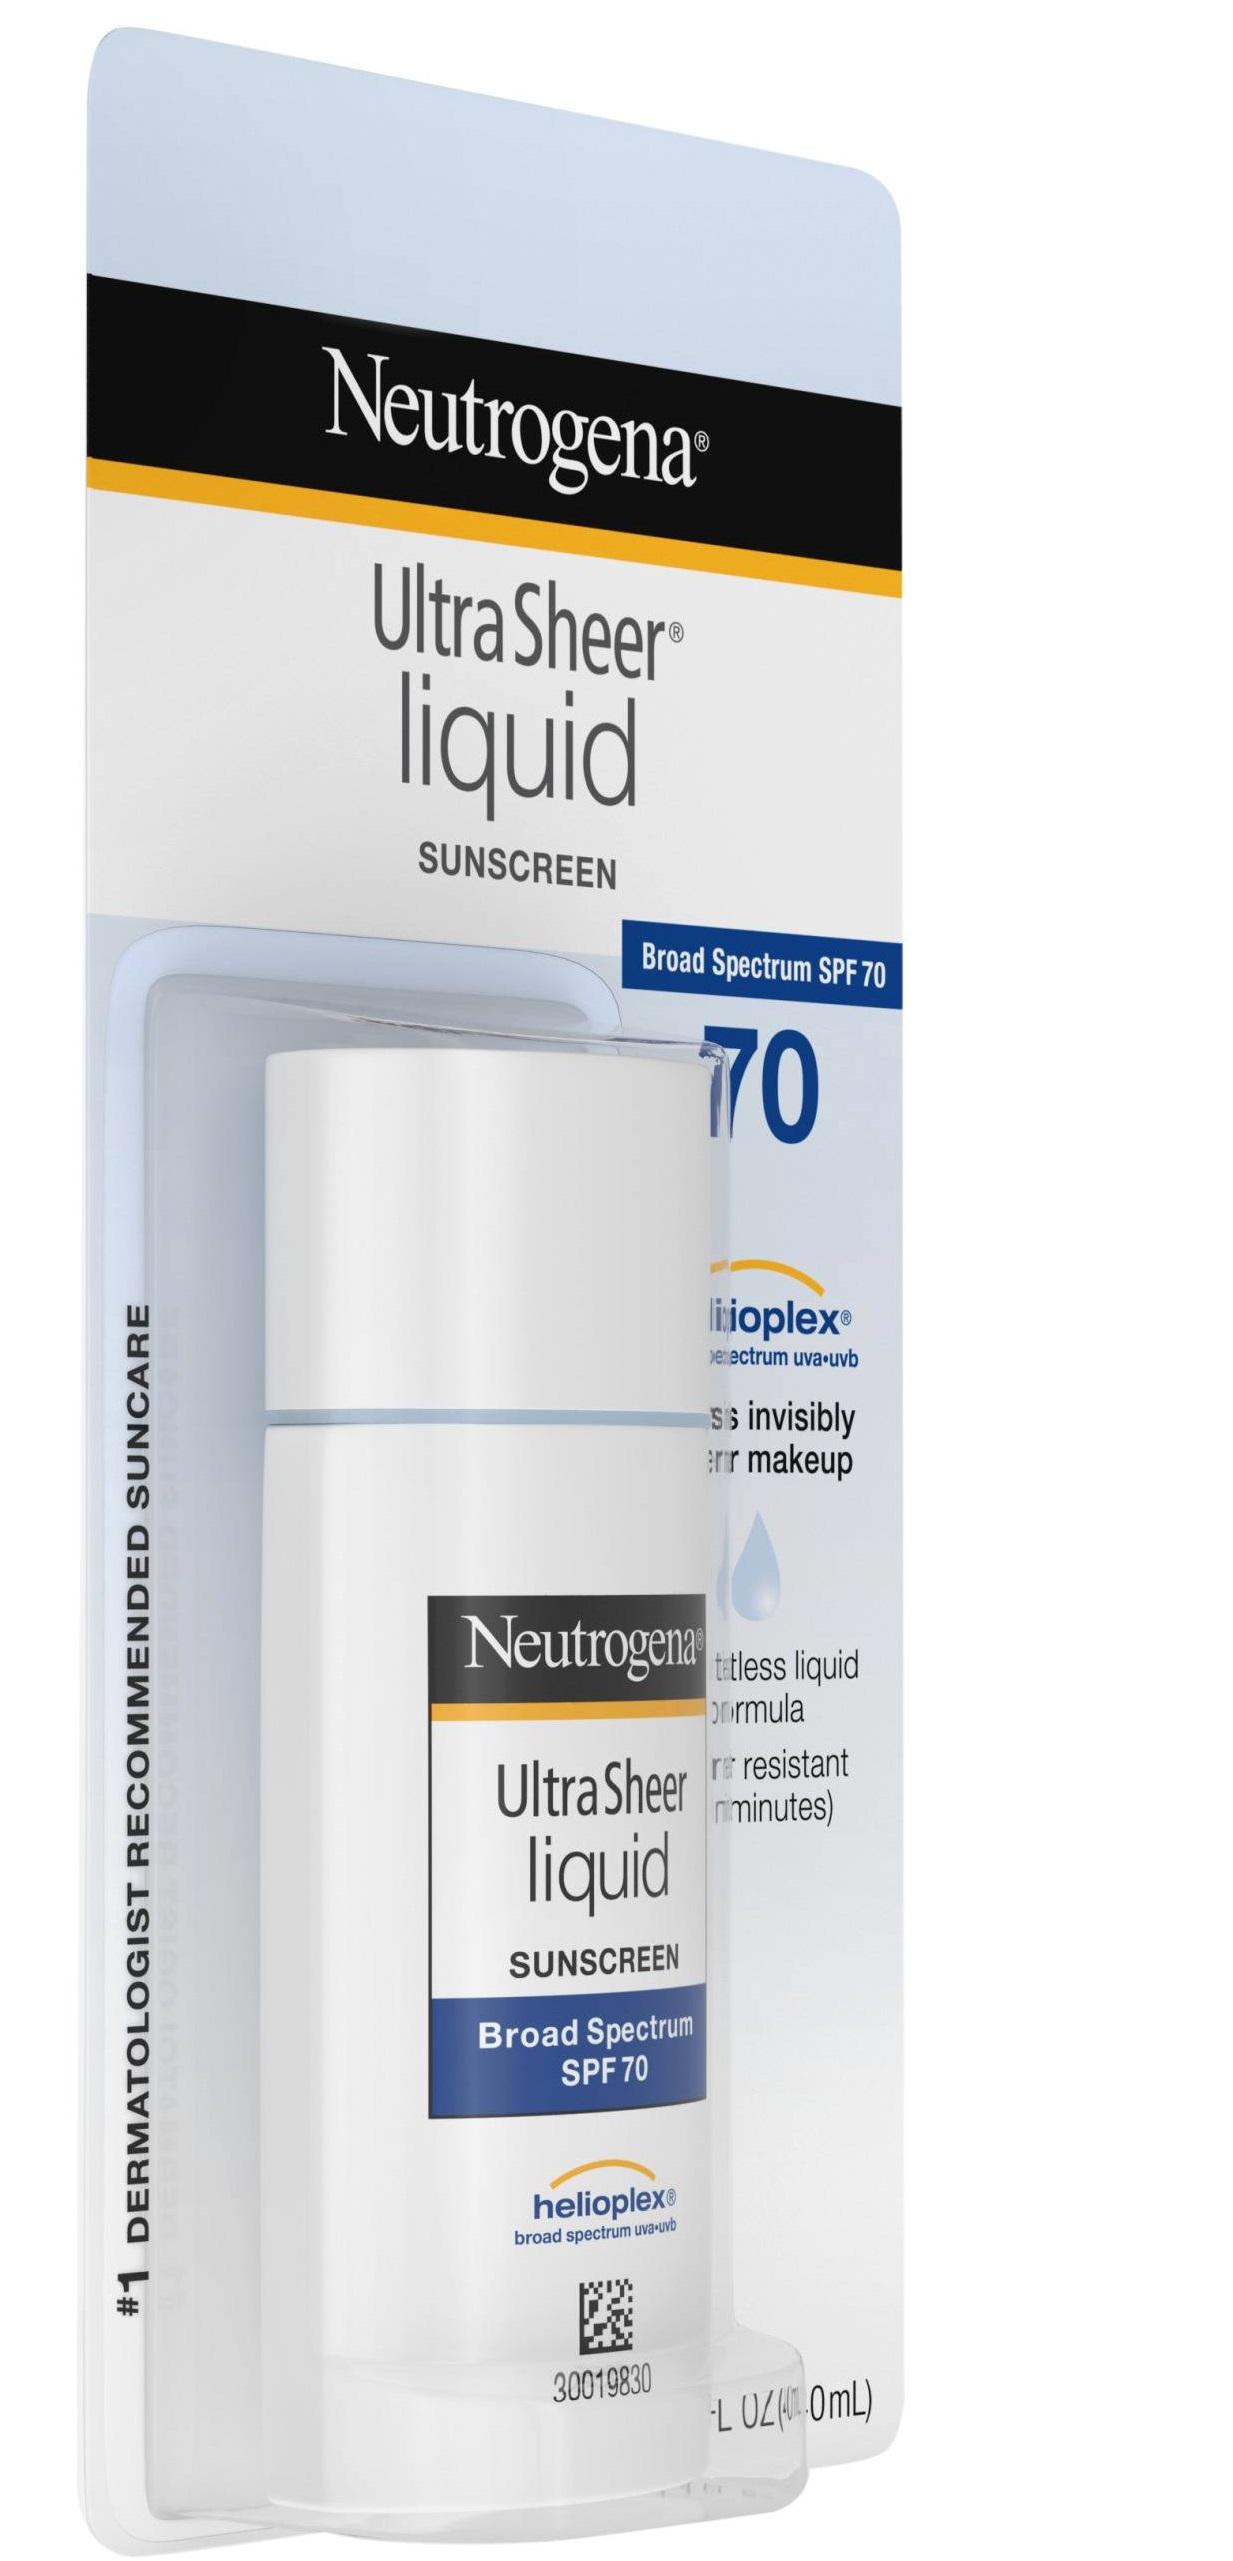 Neutrogena® Ultra Sheer Liquid Daily Sunscreen Broad Spectrum - SPF 70